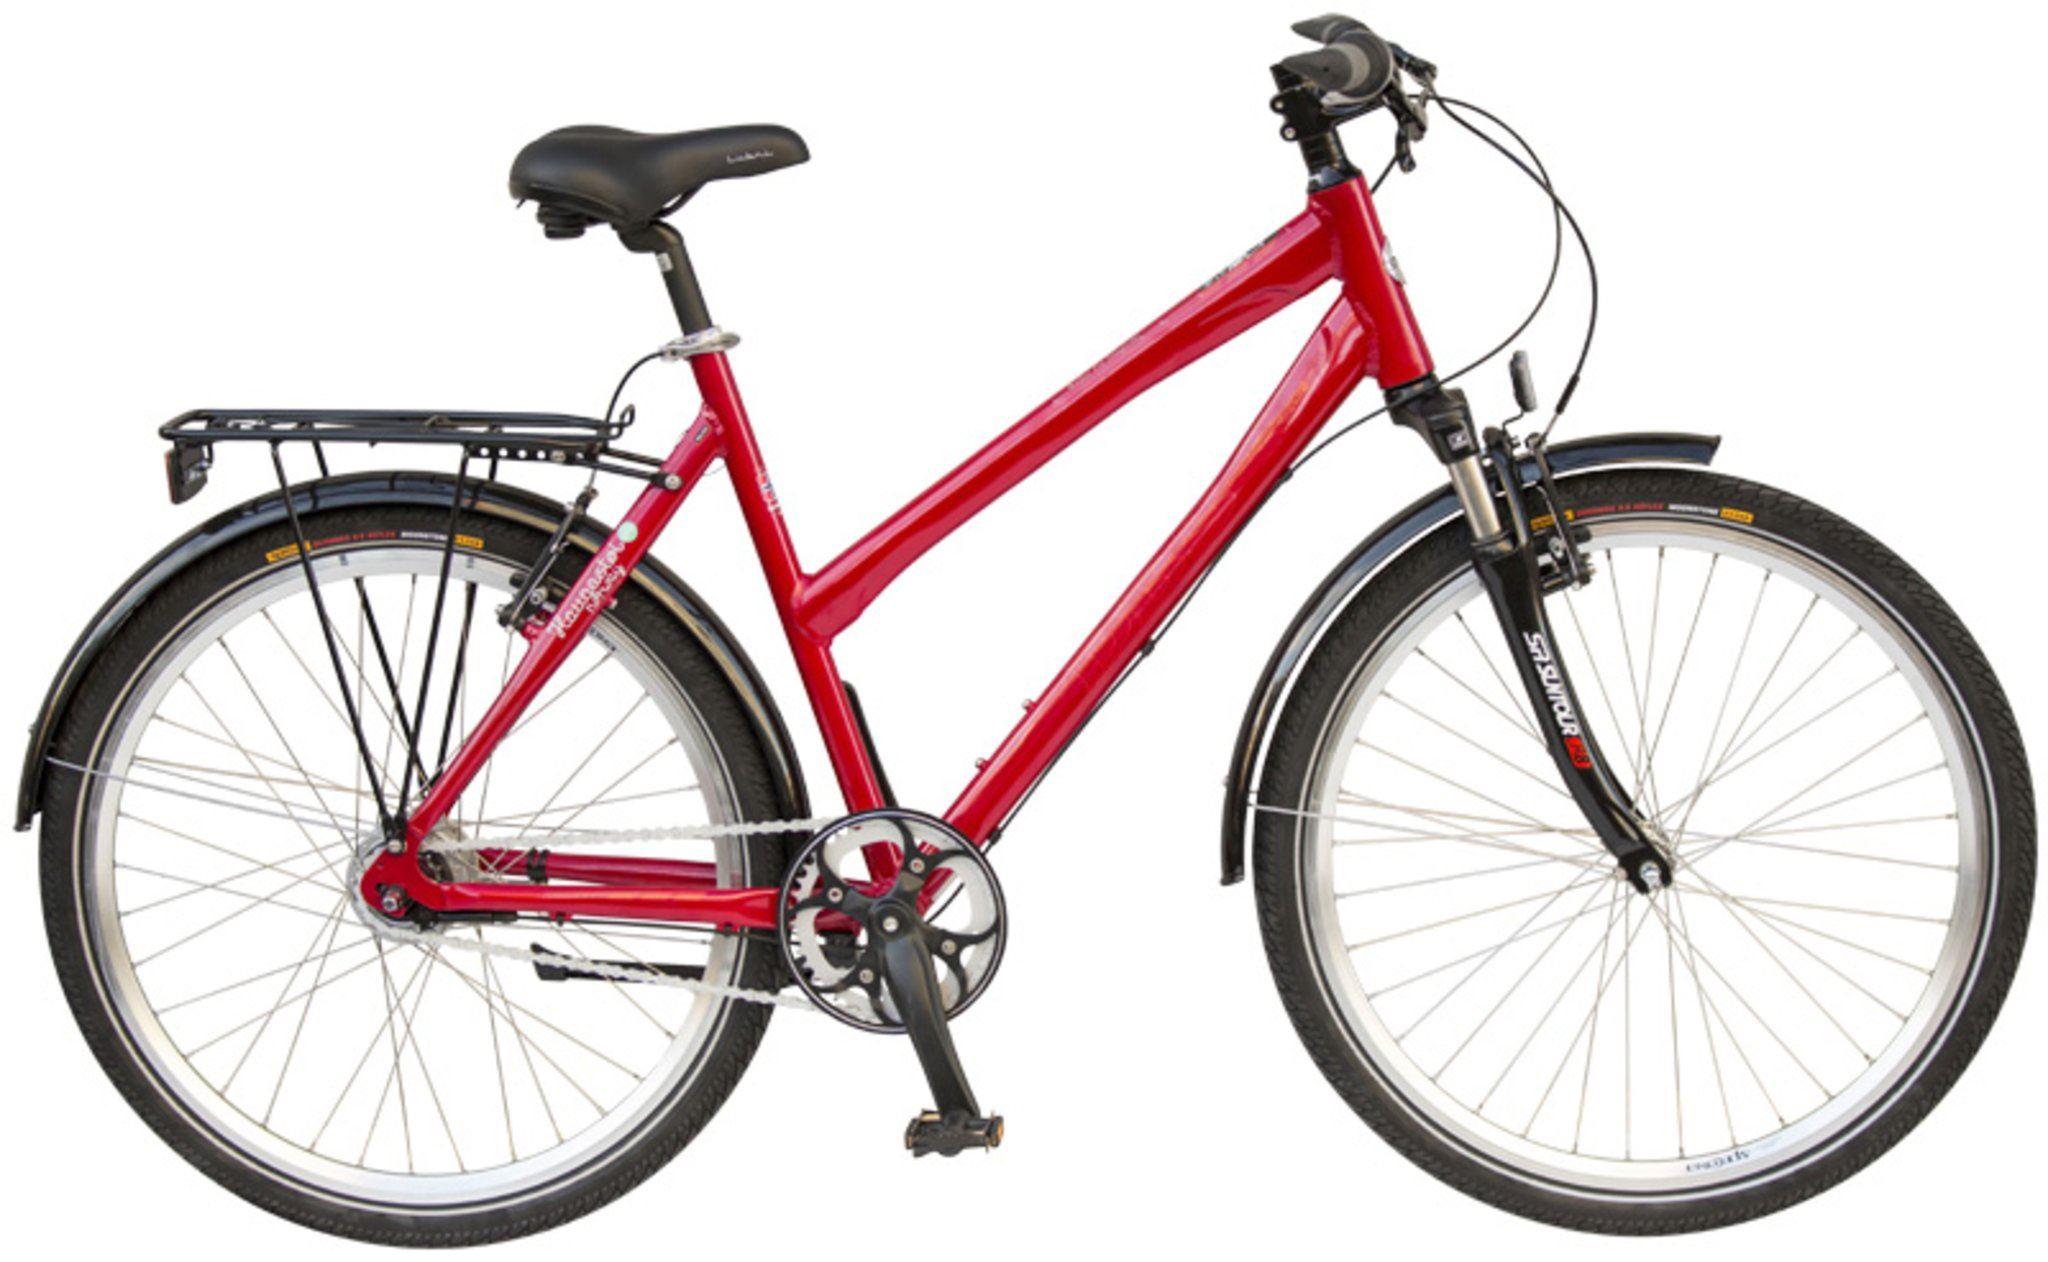 Haugastøl Sykkelutleige, Sykkelleie - Bikerental